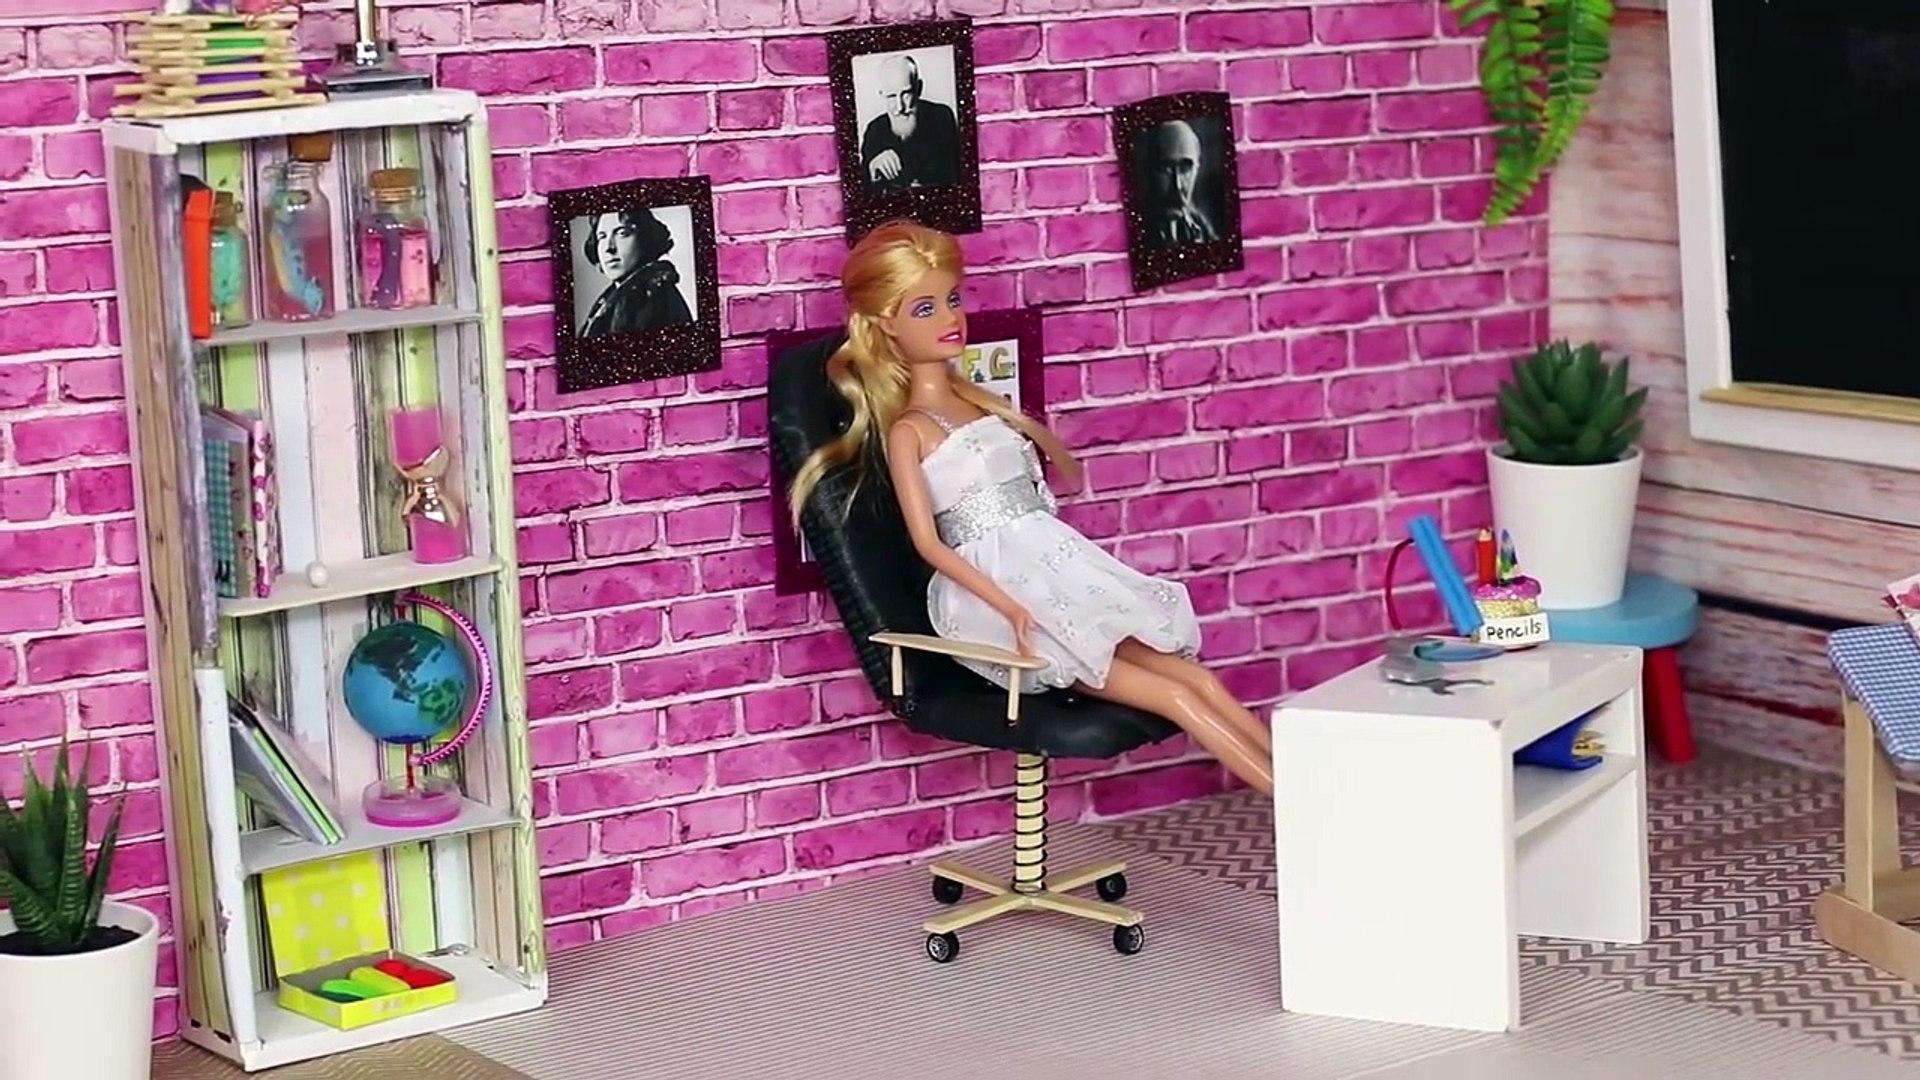 Miniaturas Para Muñecas 13 Artesanías Y útiles Escolares Para Barbie Vídeo Dailymotion